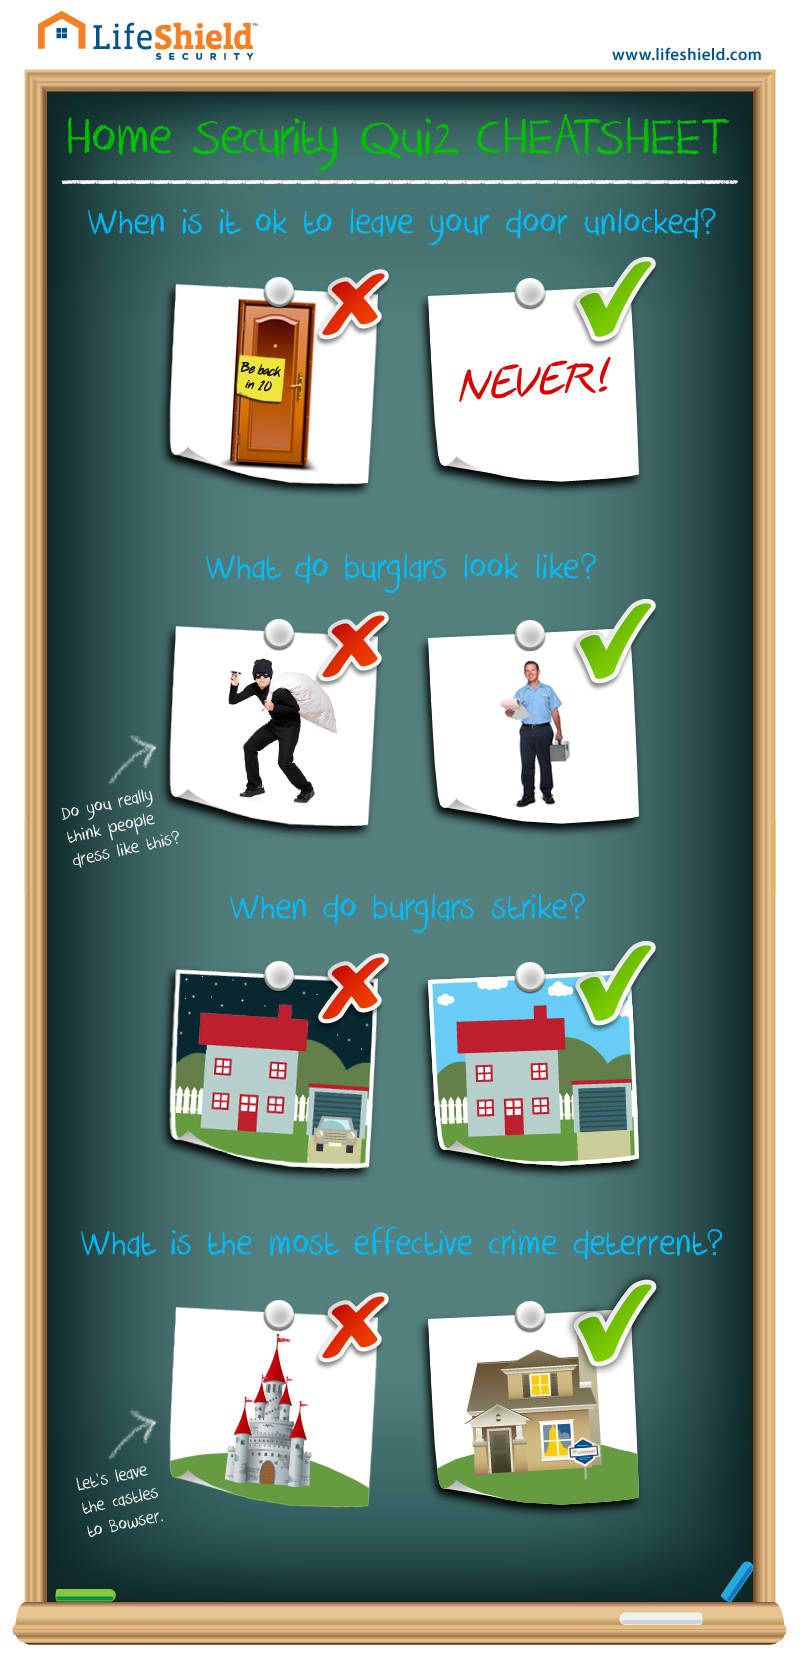 Home Security Quiz Cheatsheet Home security, Smart home